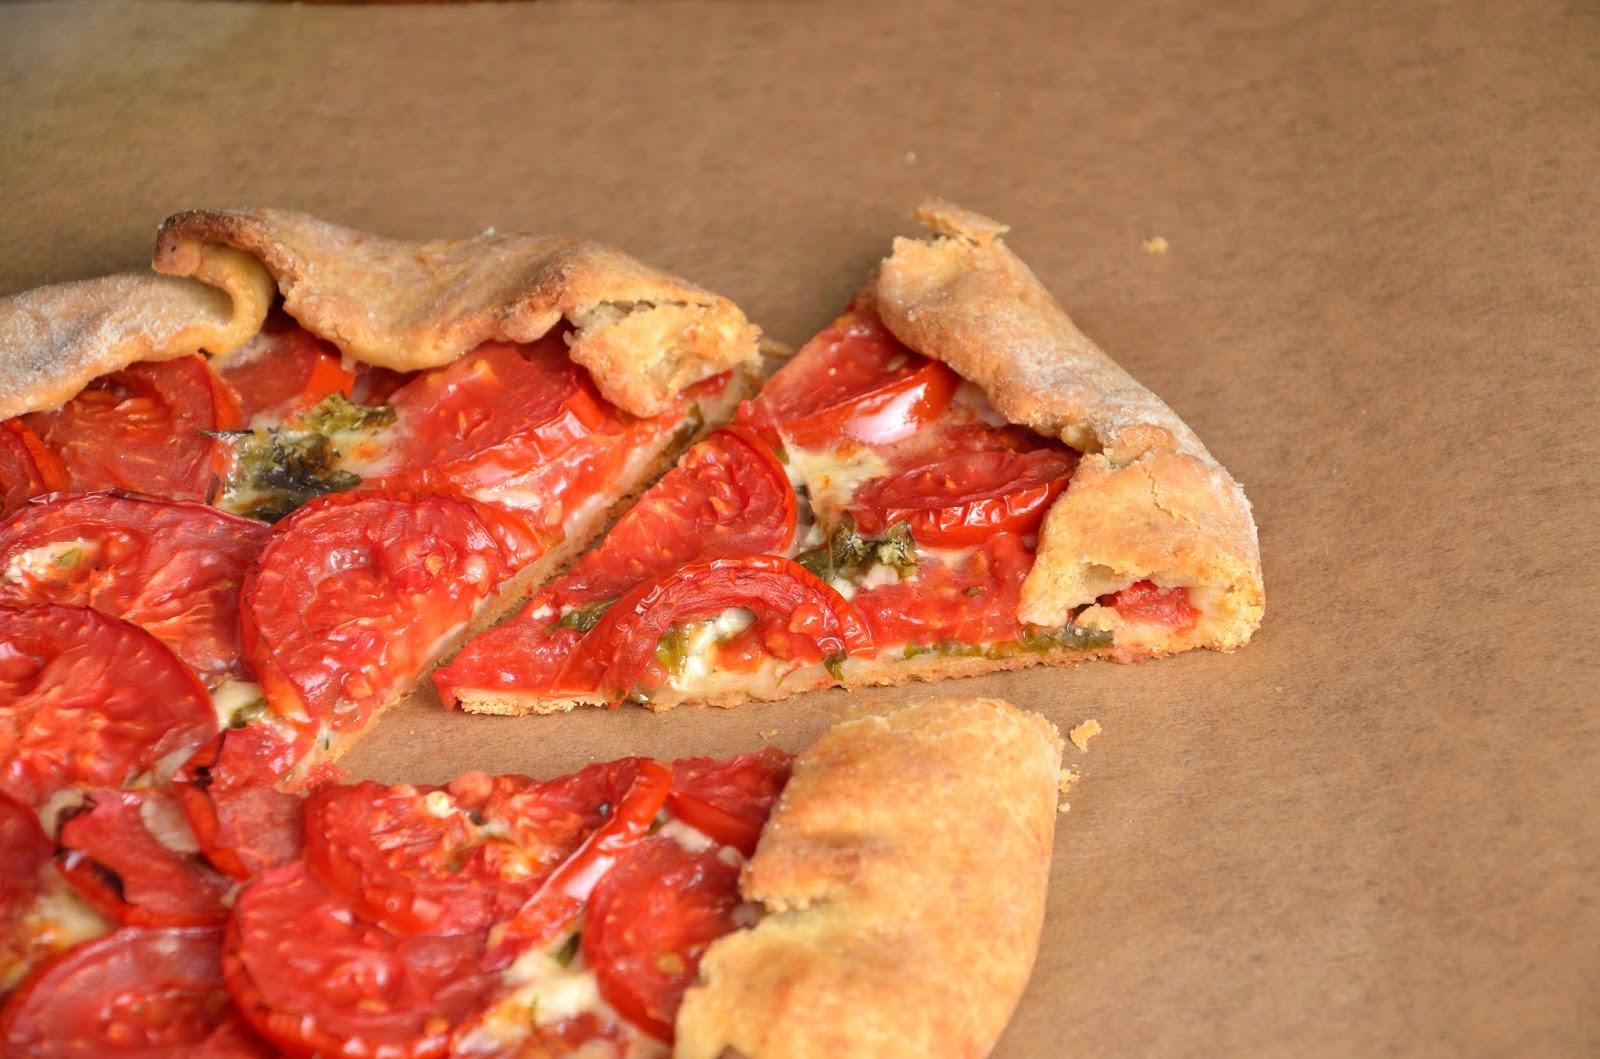 Galette z pomidorami i mozzarellą